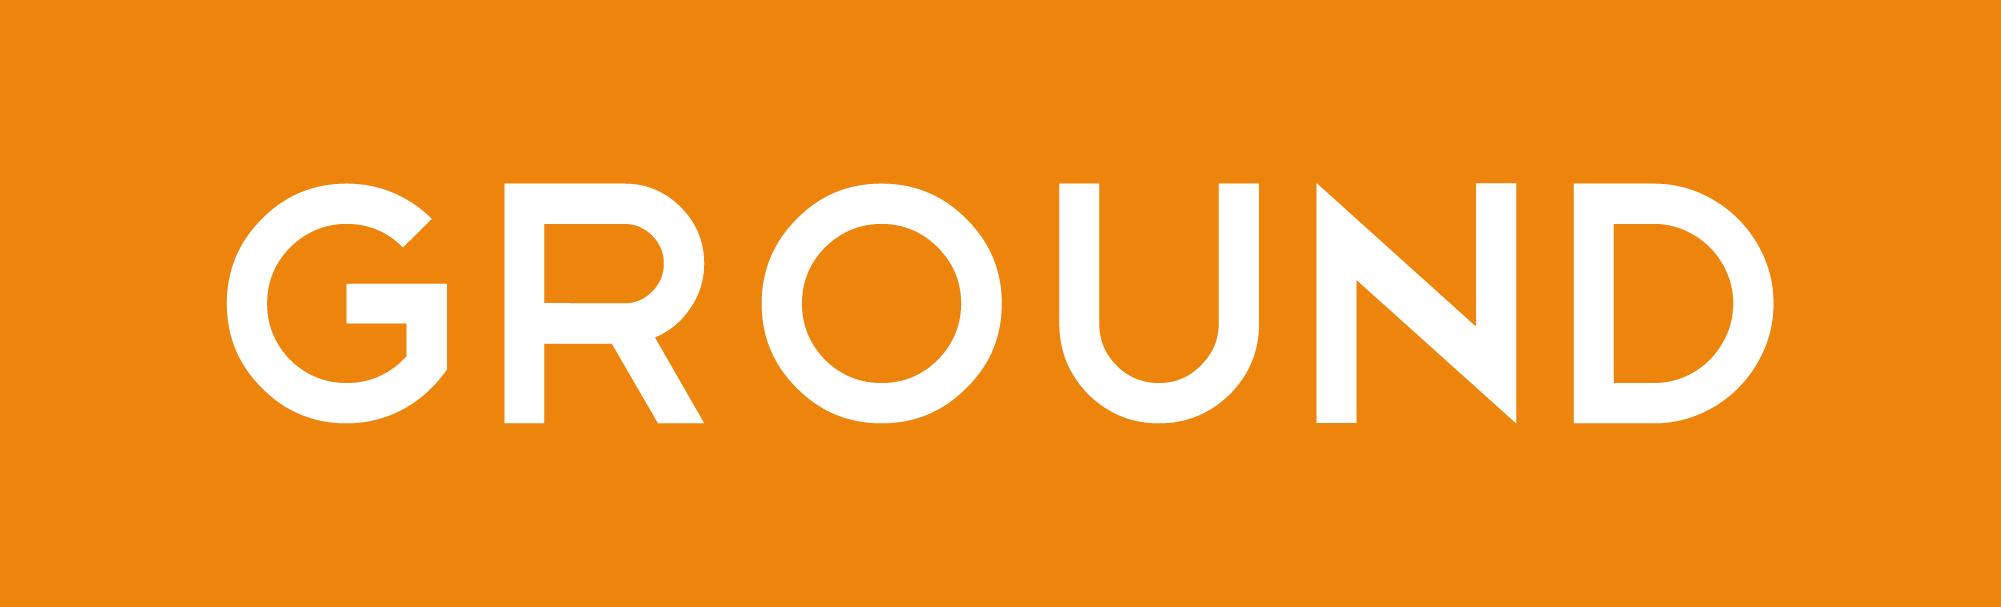 Ground-Box-Logo-2000px (1) (002)